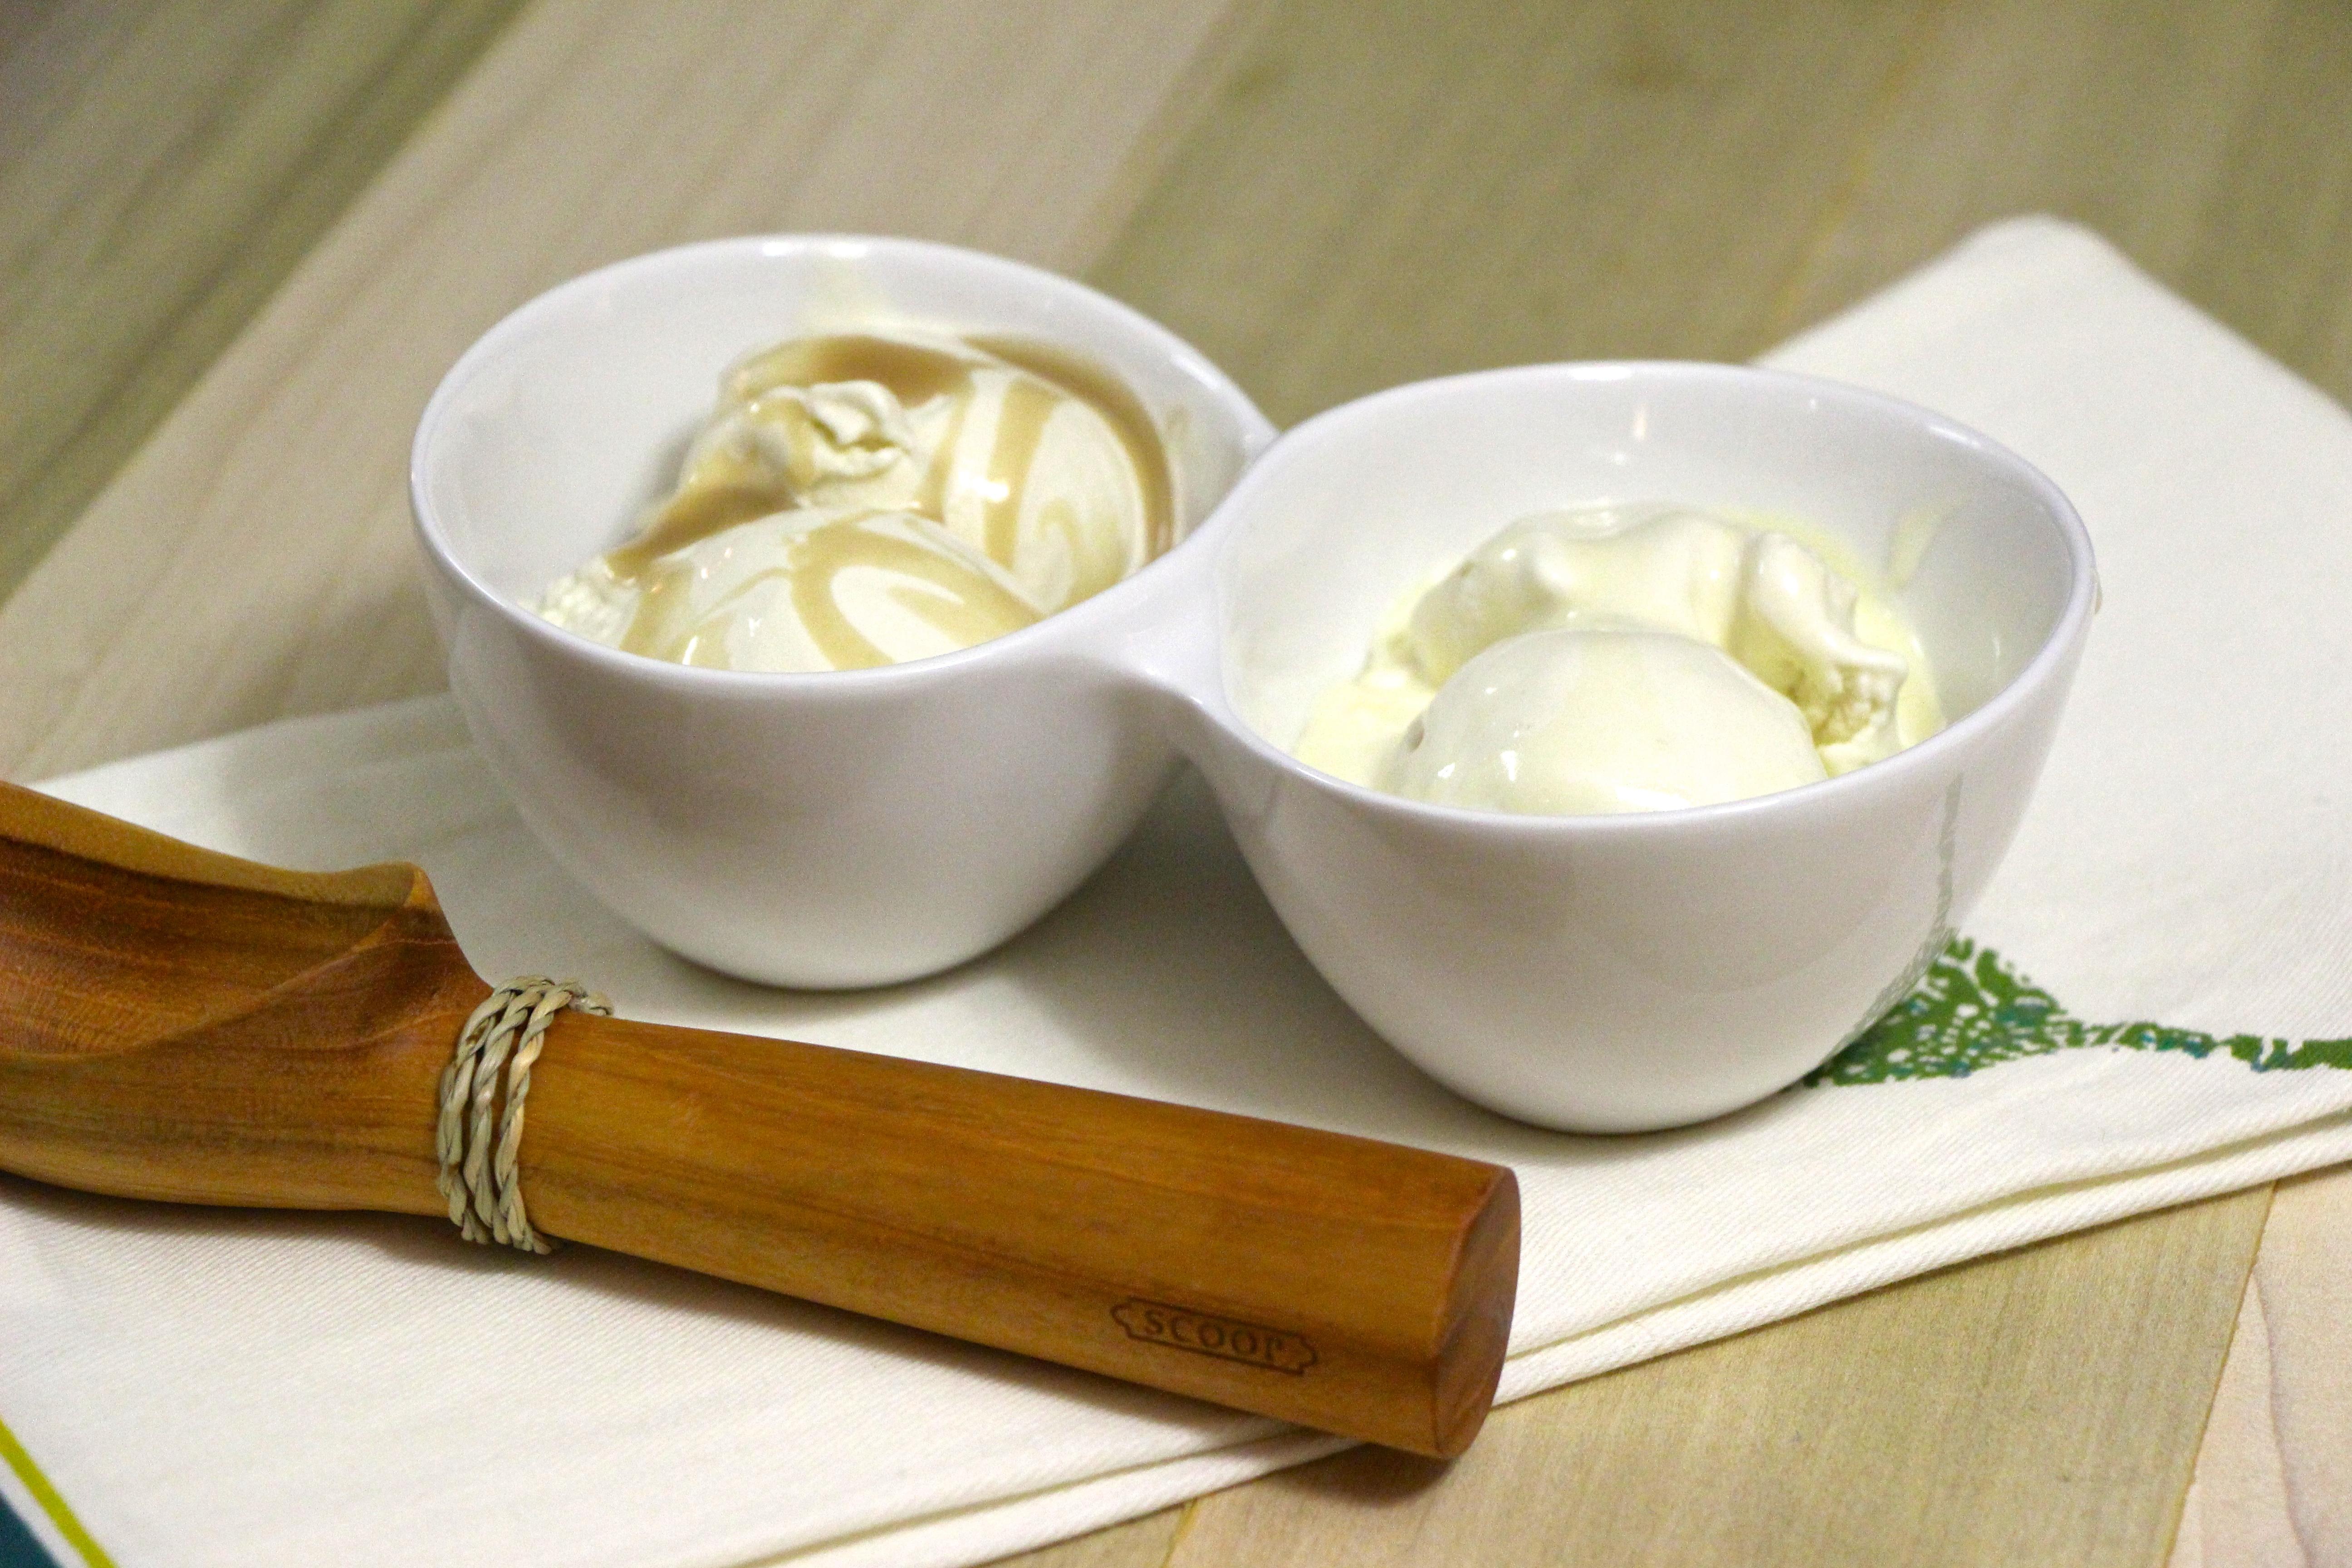 Coconut Milk Ice Cream with Caramel Sauce